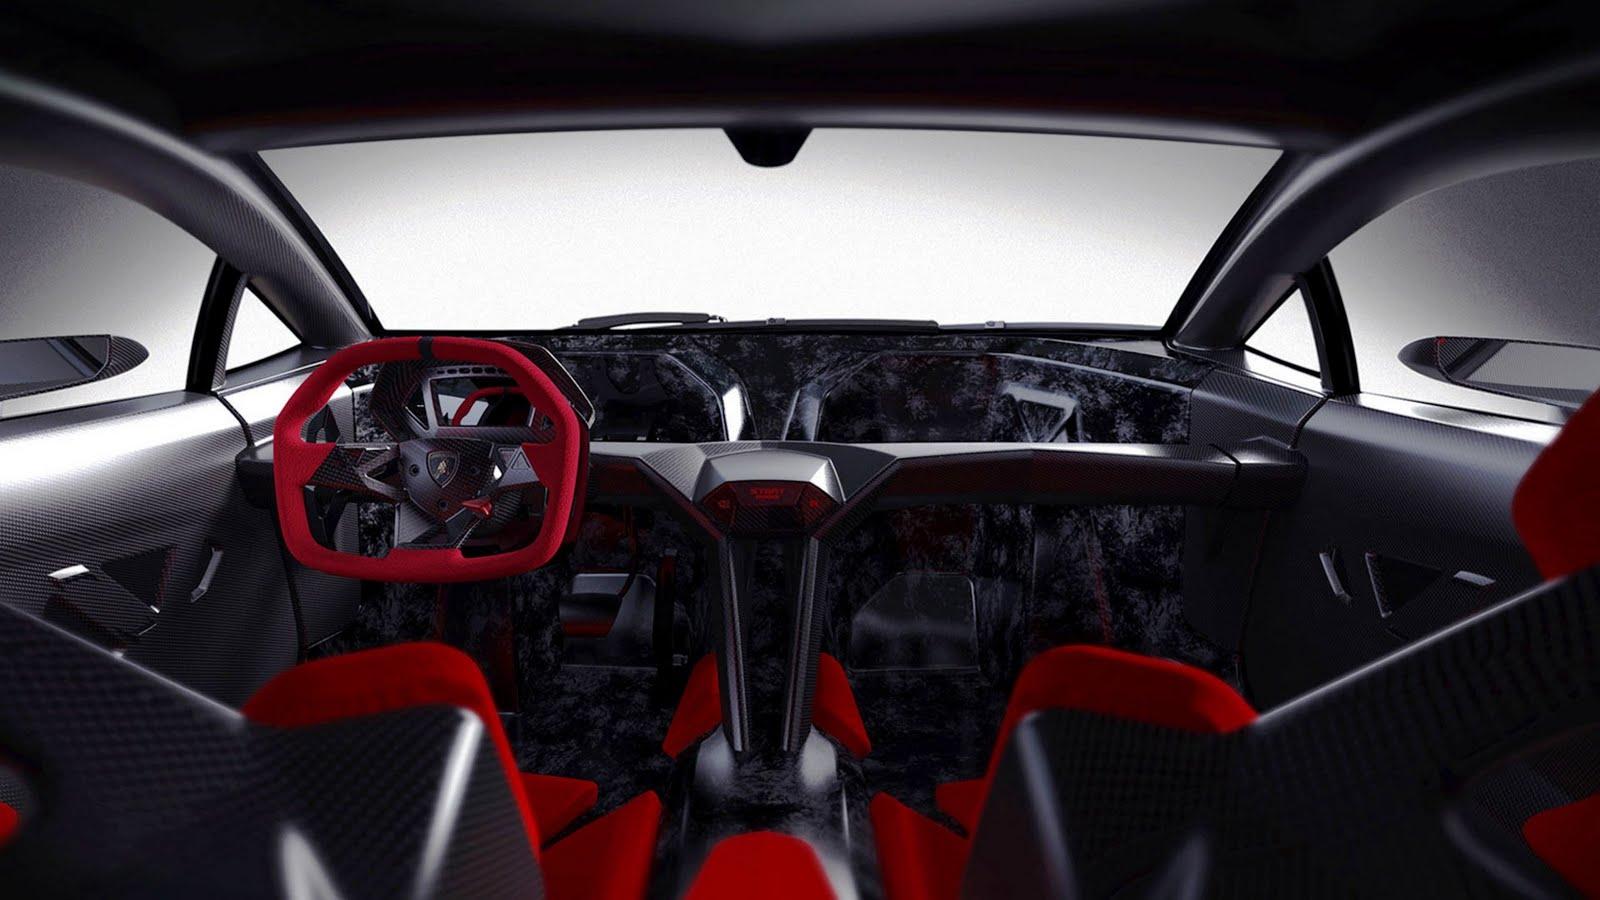 Full HD Exotic Car Wallpapers: 2011 Lamborghini Sesto Elemento